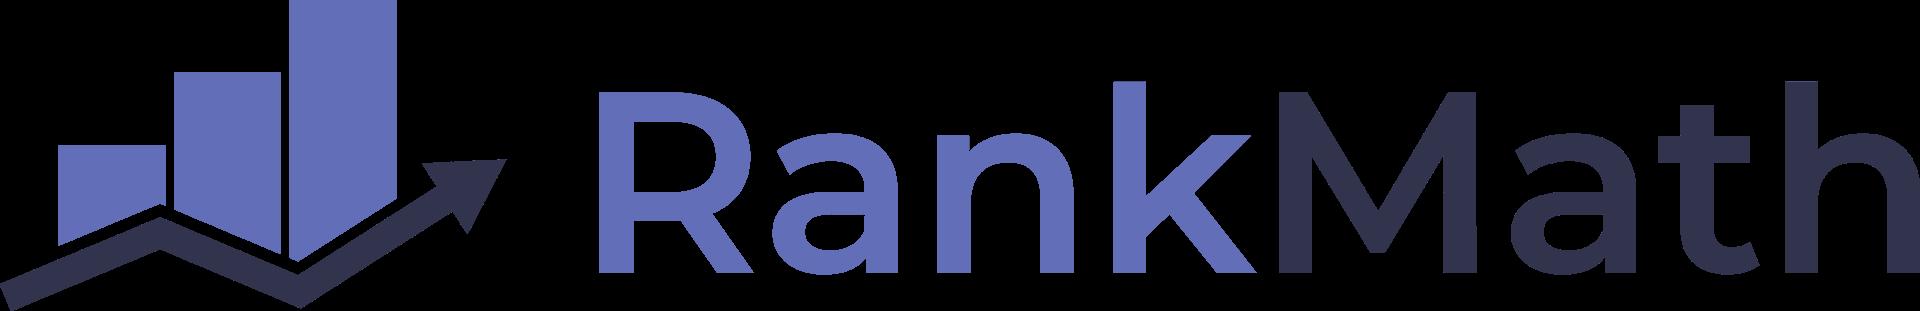 rank-math-logo-large